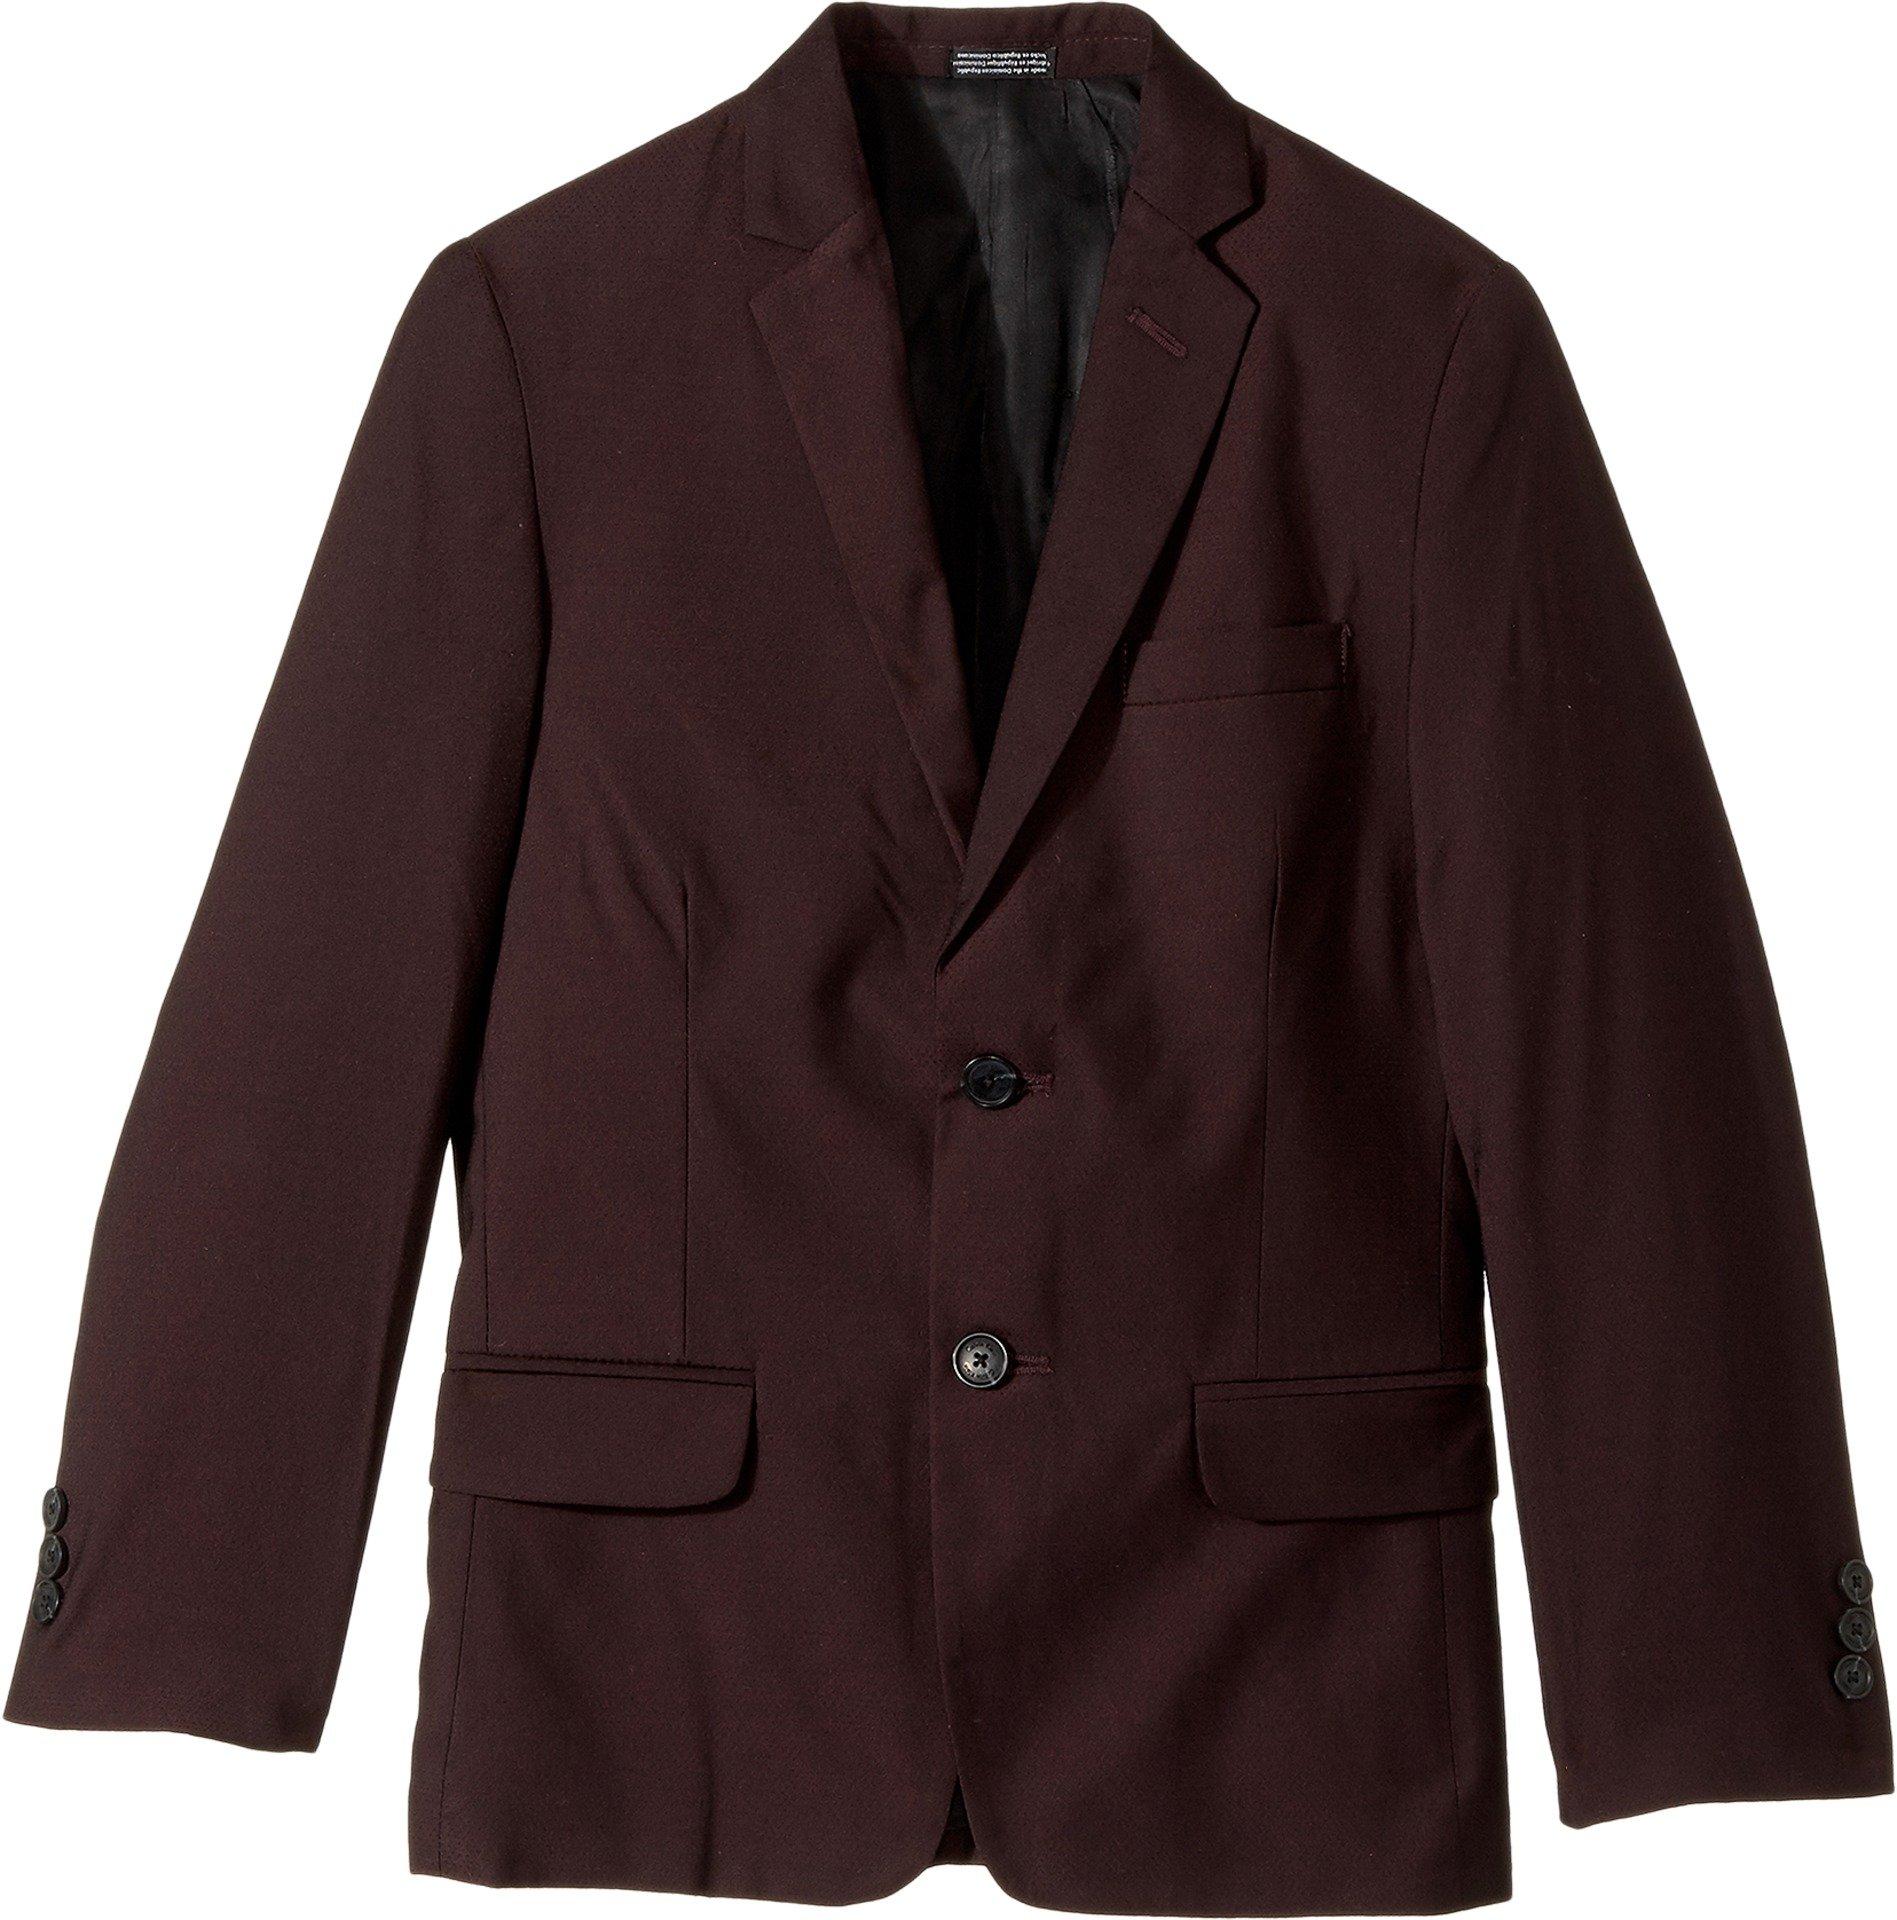 Calvin Klein Big Boys' Blazer Jacket, Square Burgundy, 16